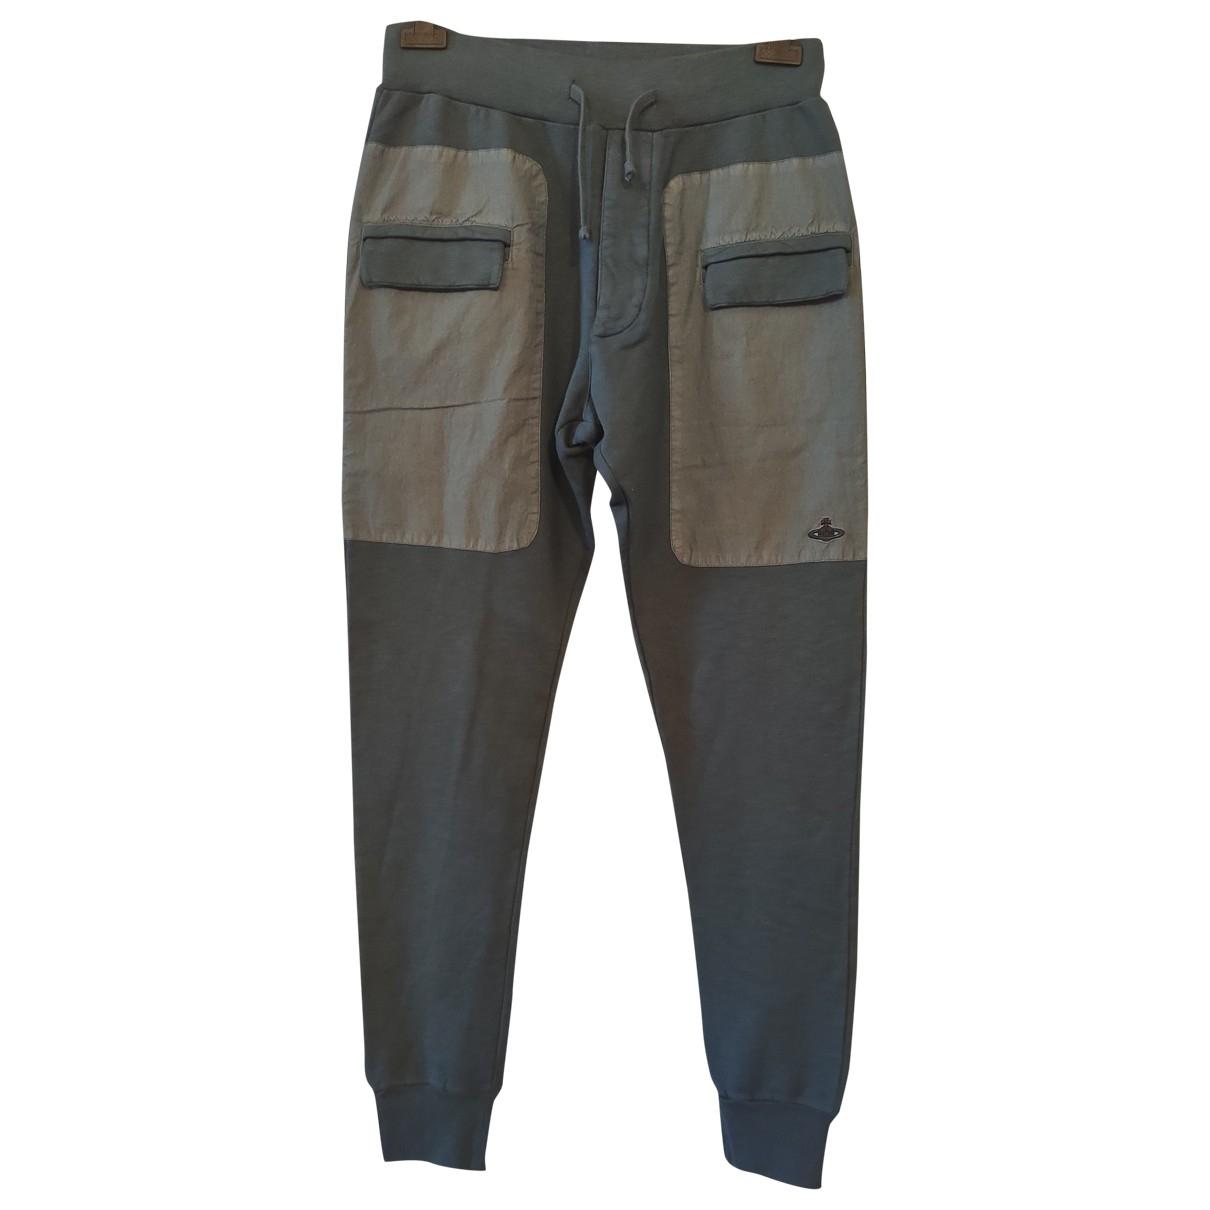 Vivienne Westwood \N Grey Cotton Trousers for Men M International